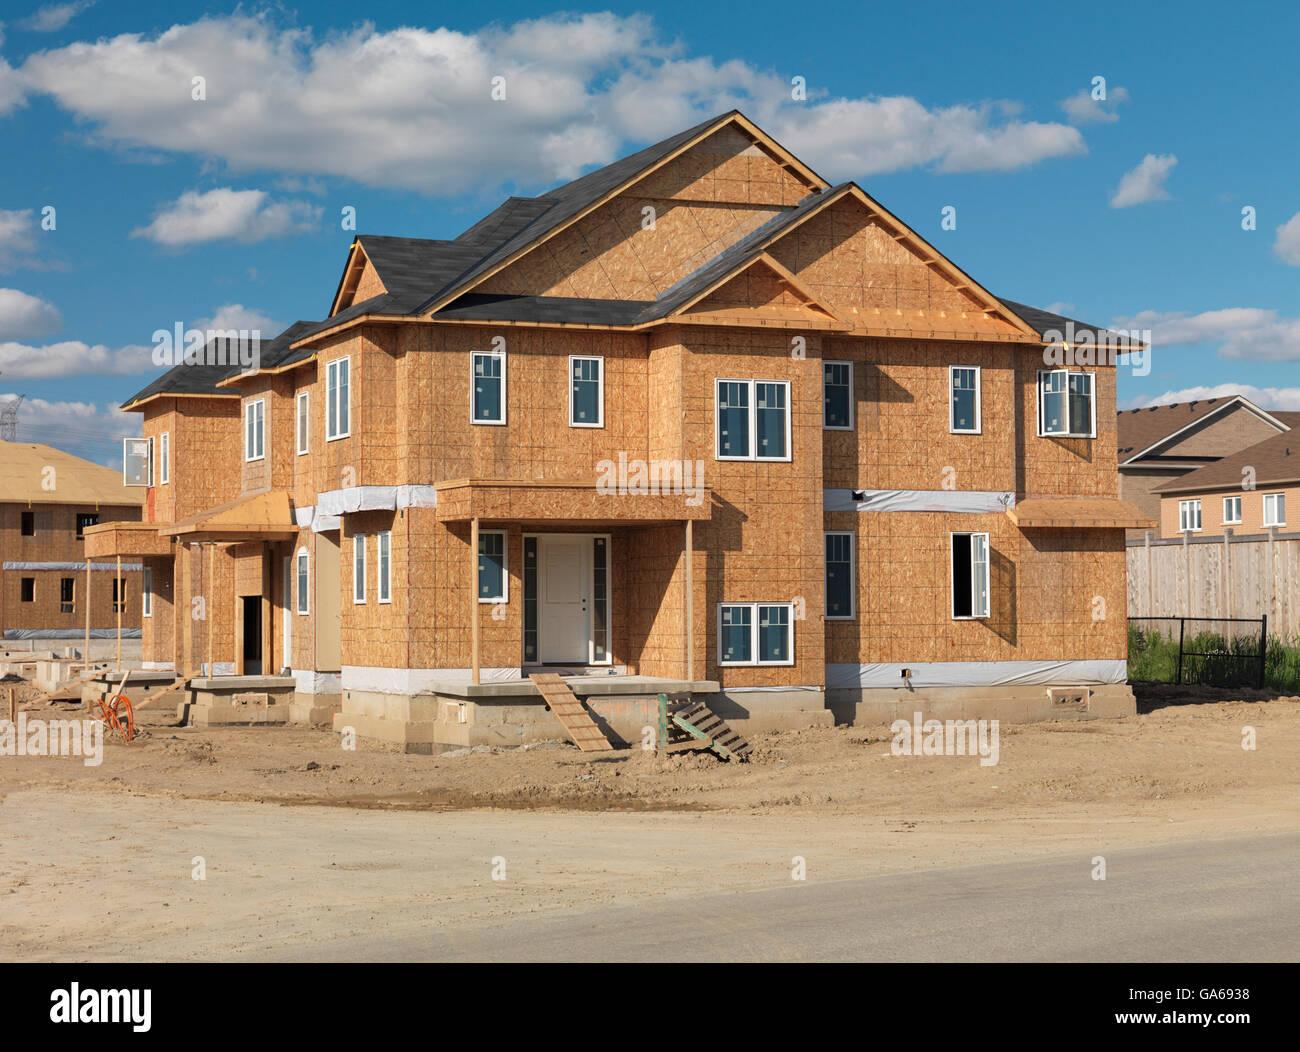 Milton ontario canada stock photos milton ontario canada for How to frame a two story house